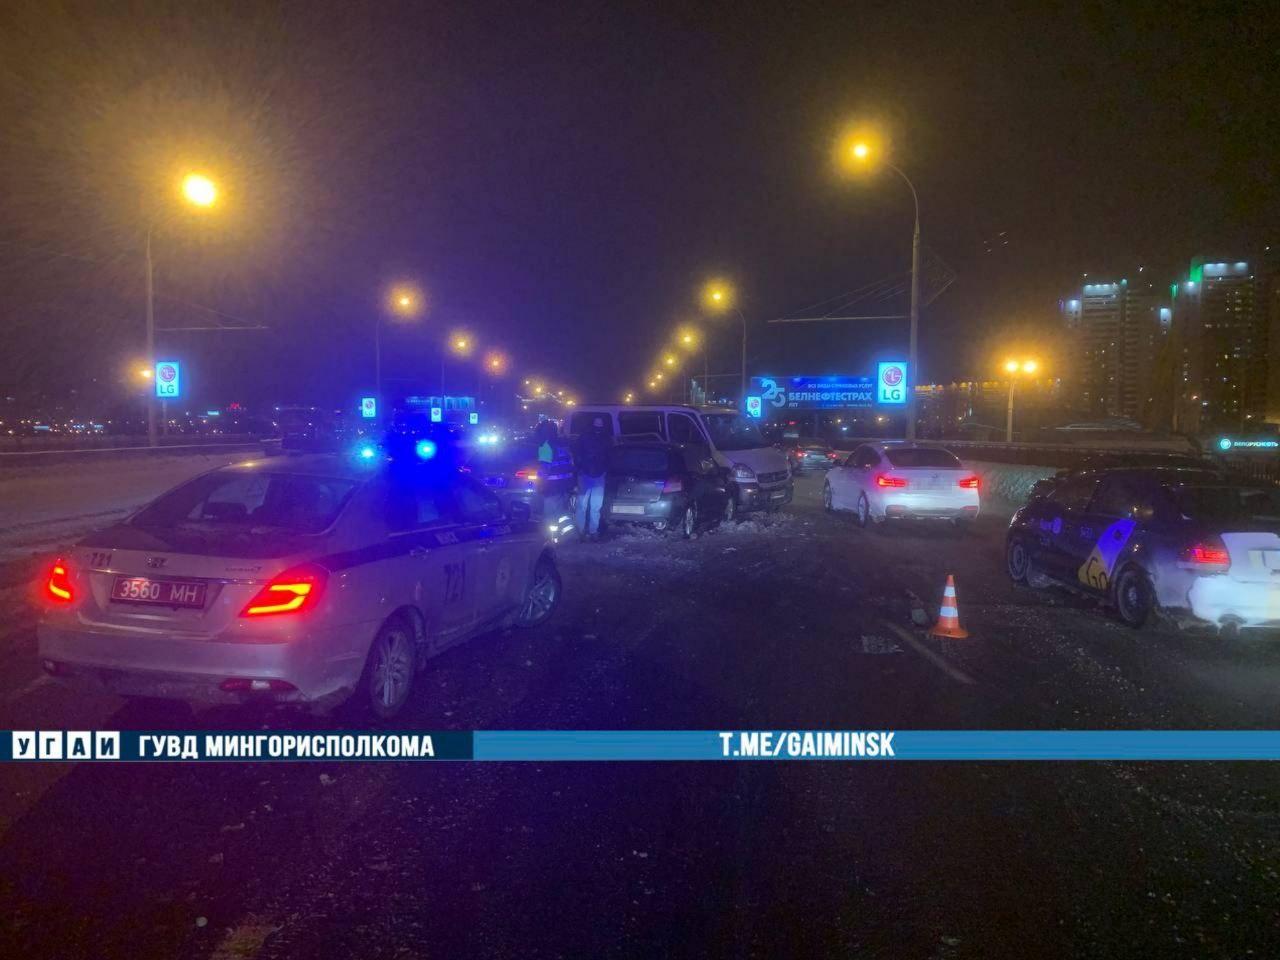 Три автомобиля столкнулись на проспекте Независимости в Минске